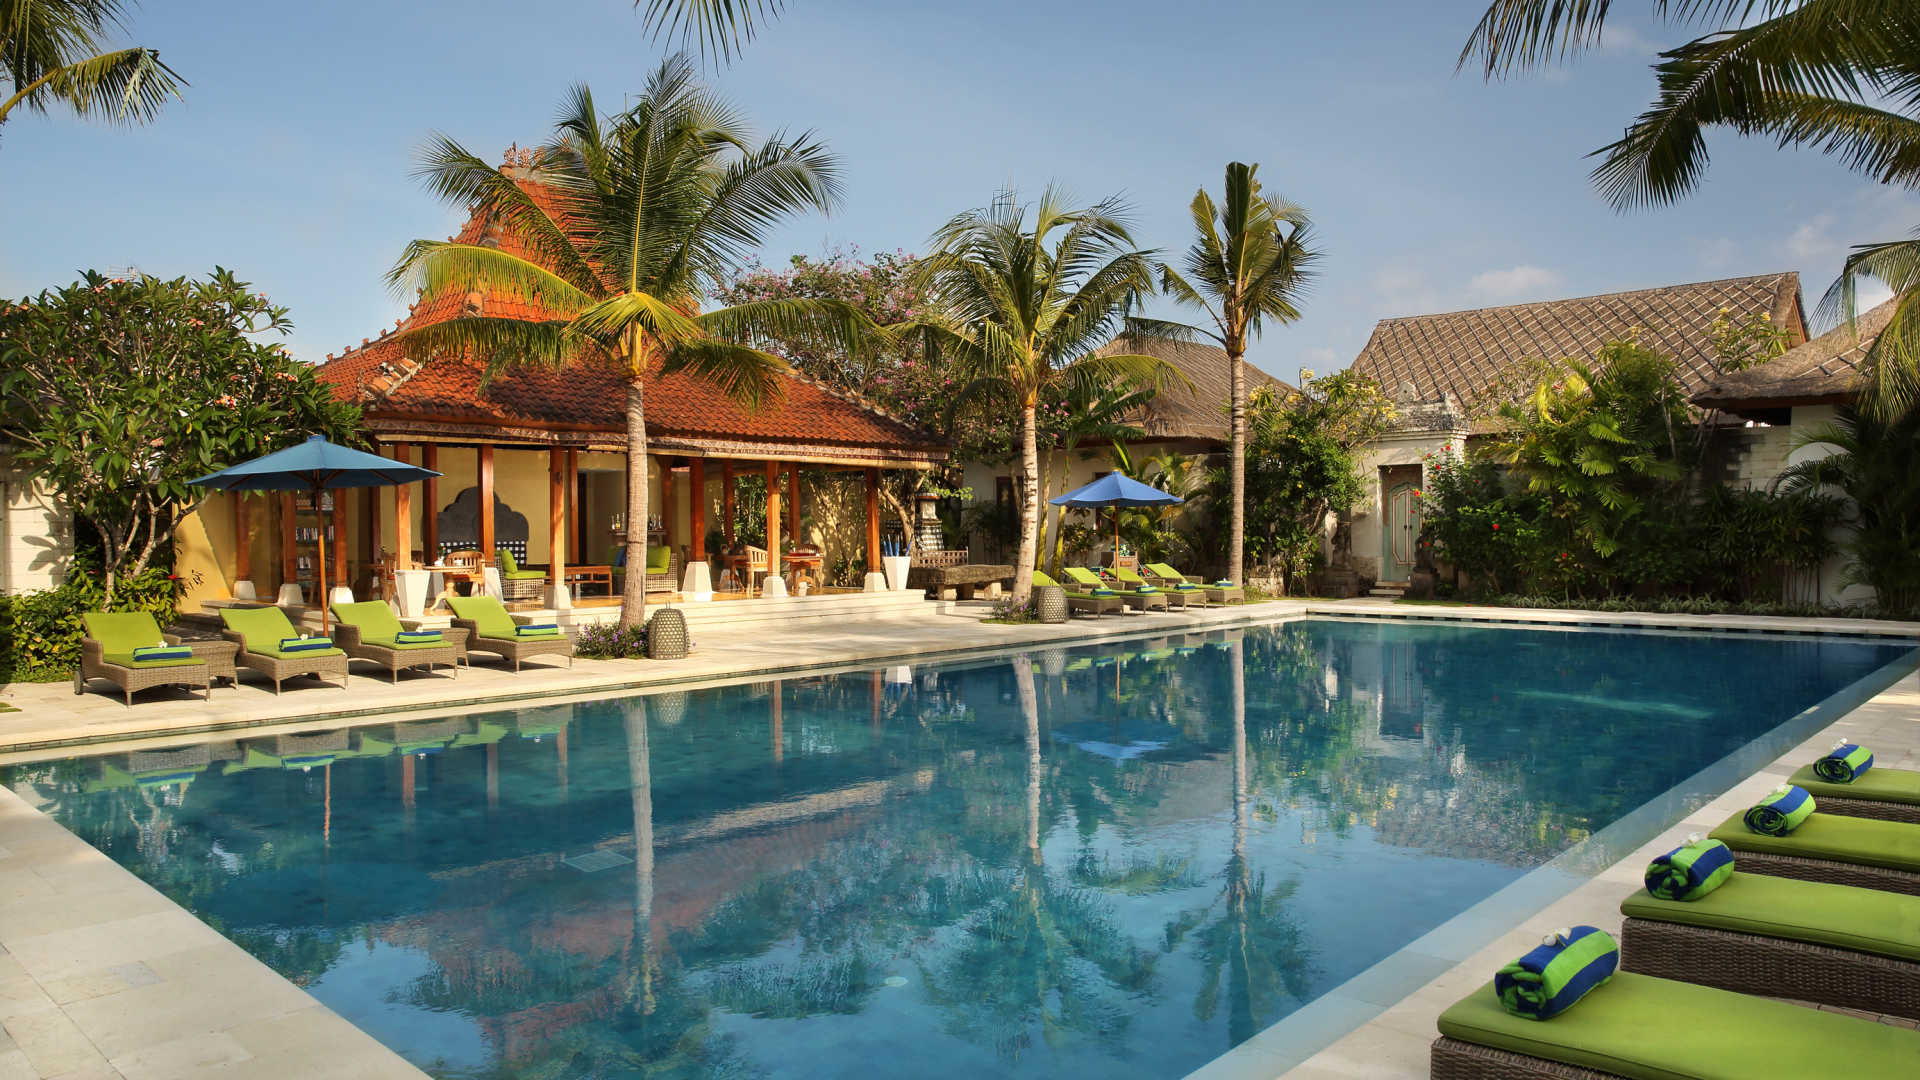 Incredible Value 7Nt Bali Getaway from £899pp